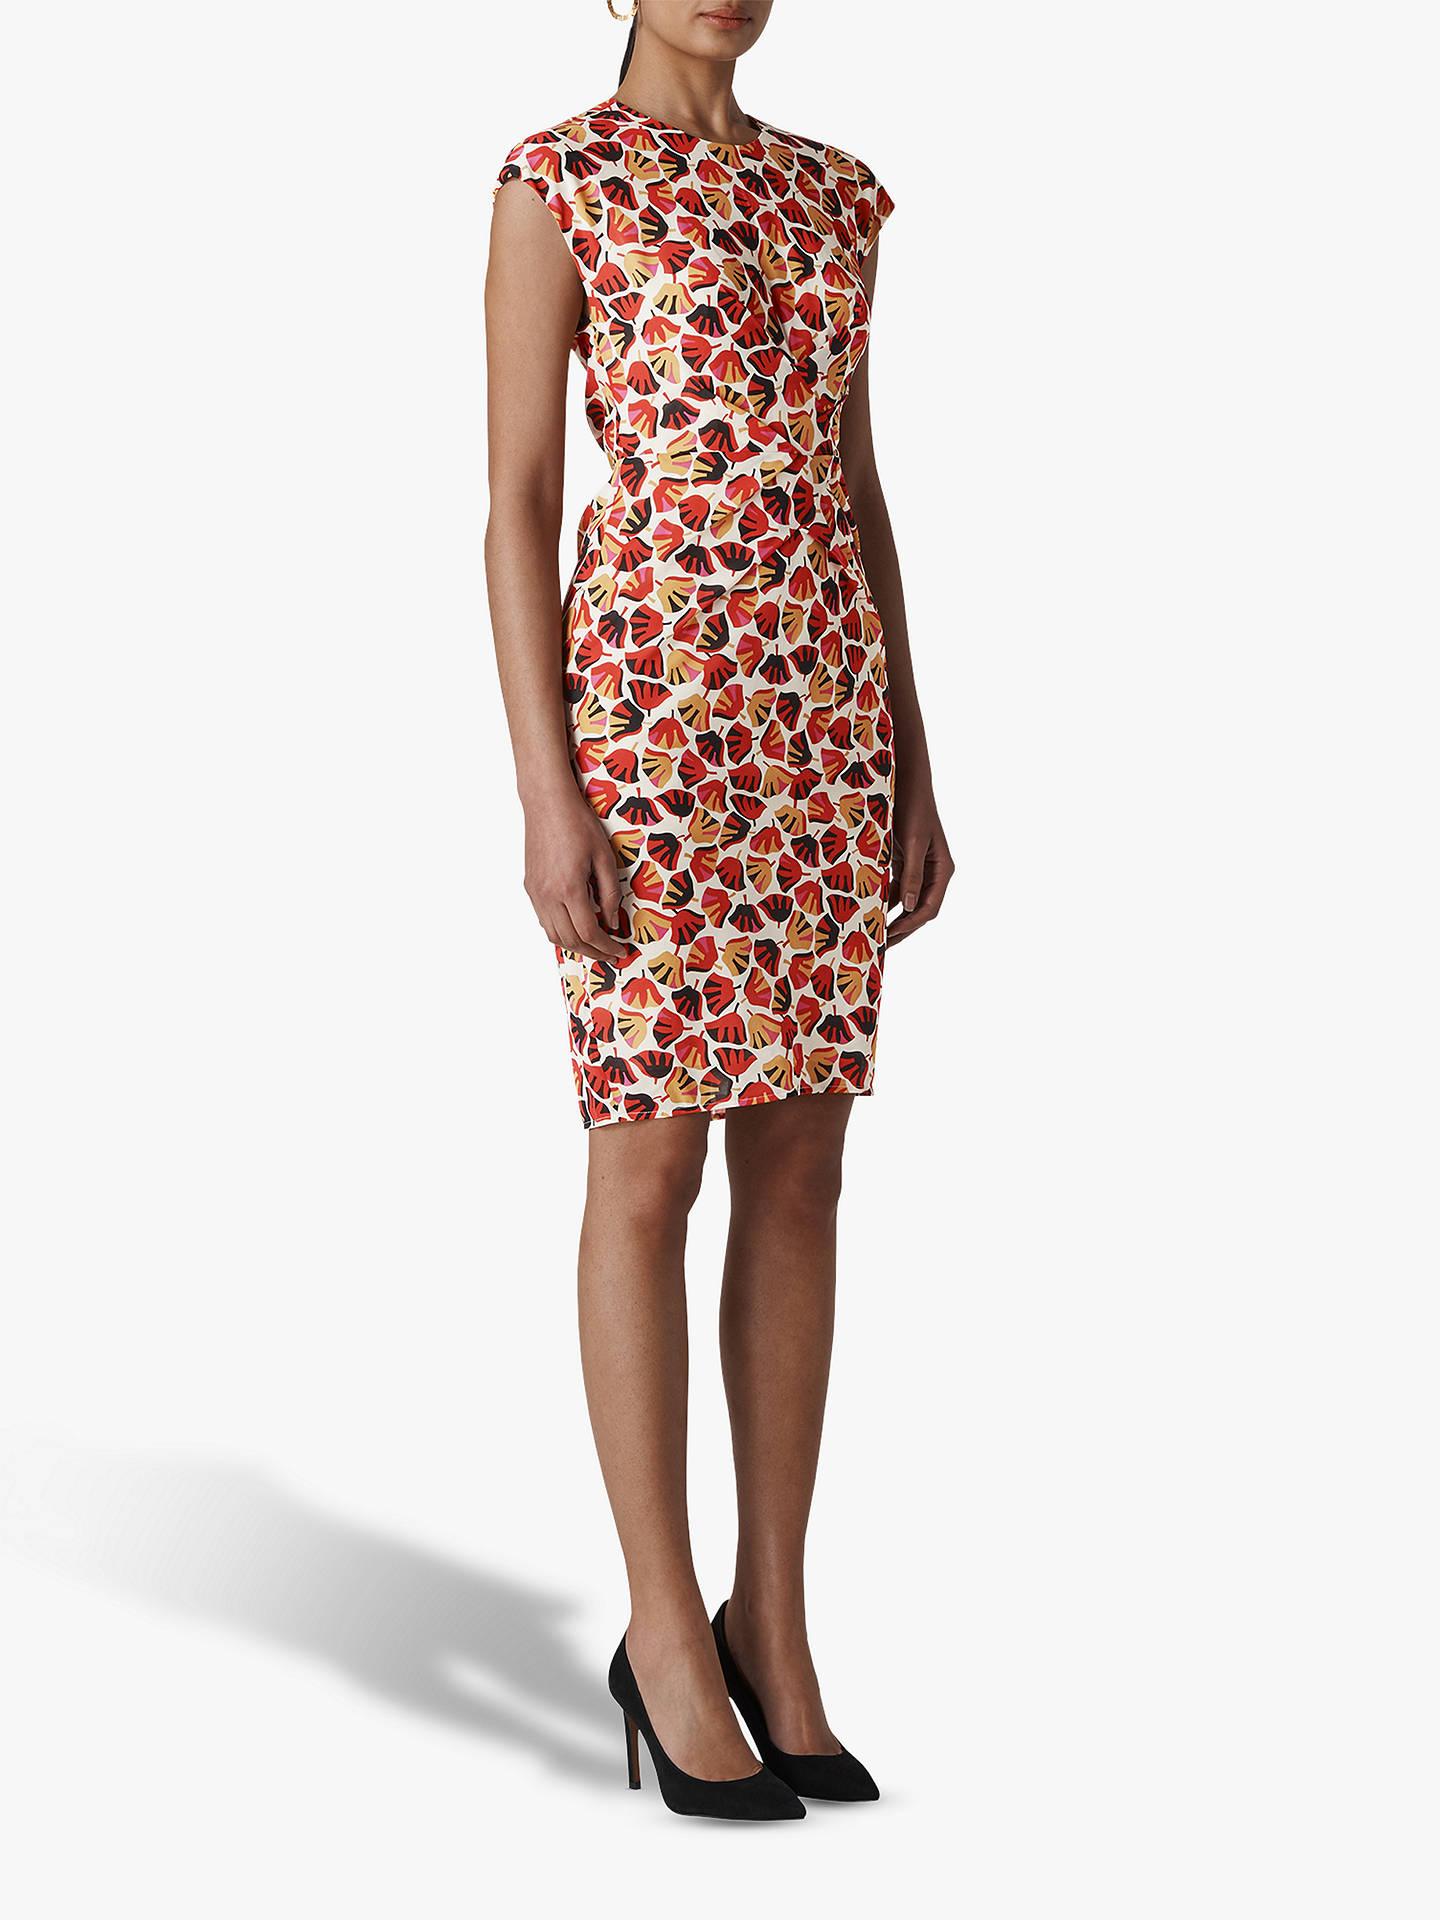 665de2cf5b96b Whistles Flower Pod Silk Blend Bodycon Dress, Pink/Multi at John ...